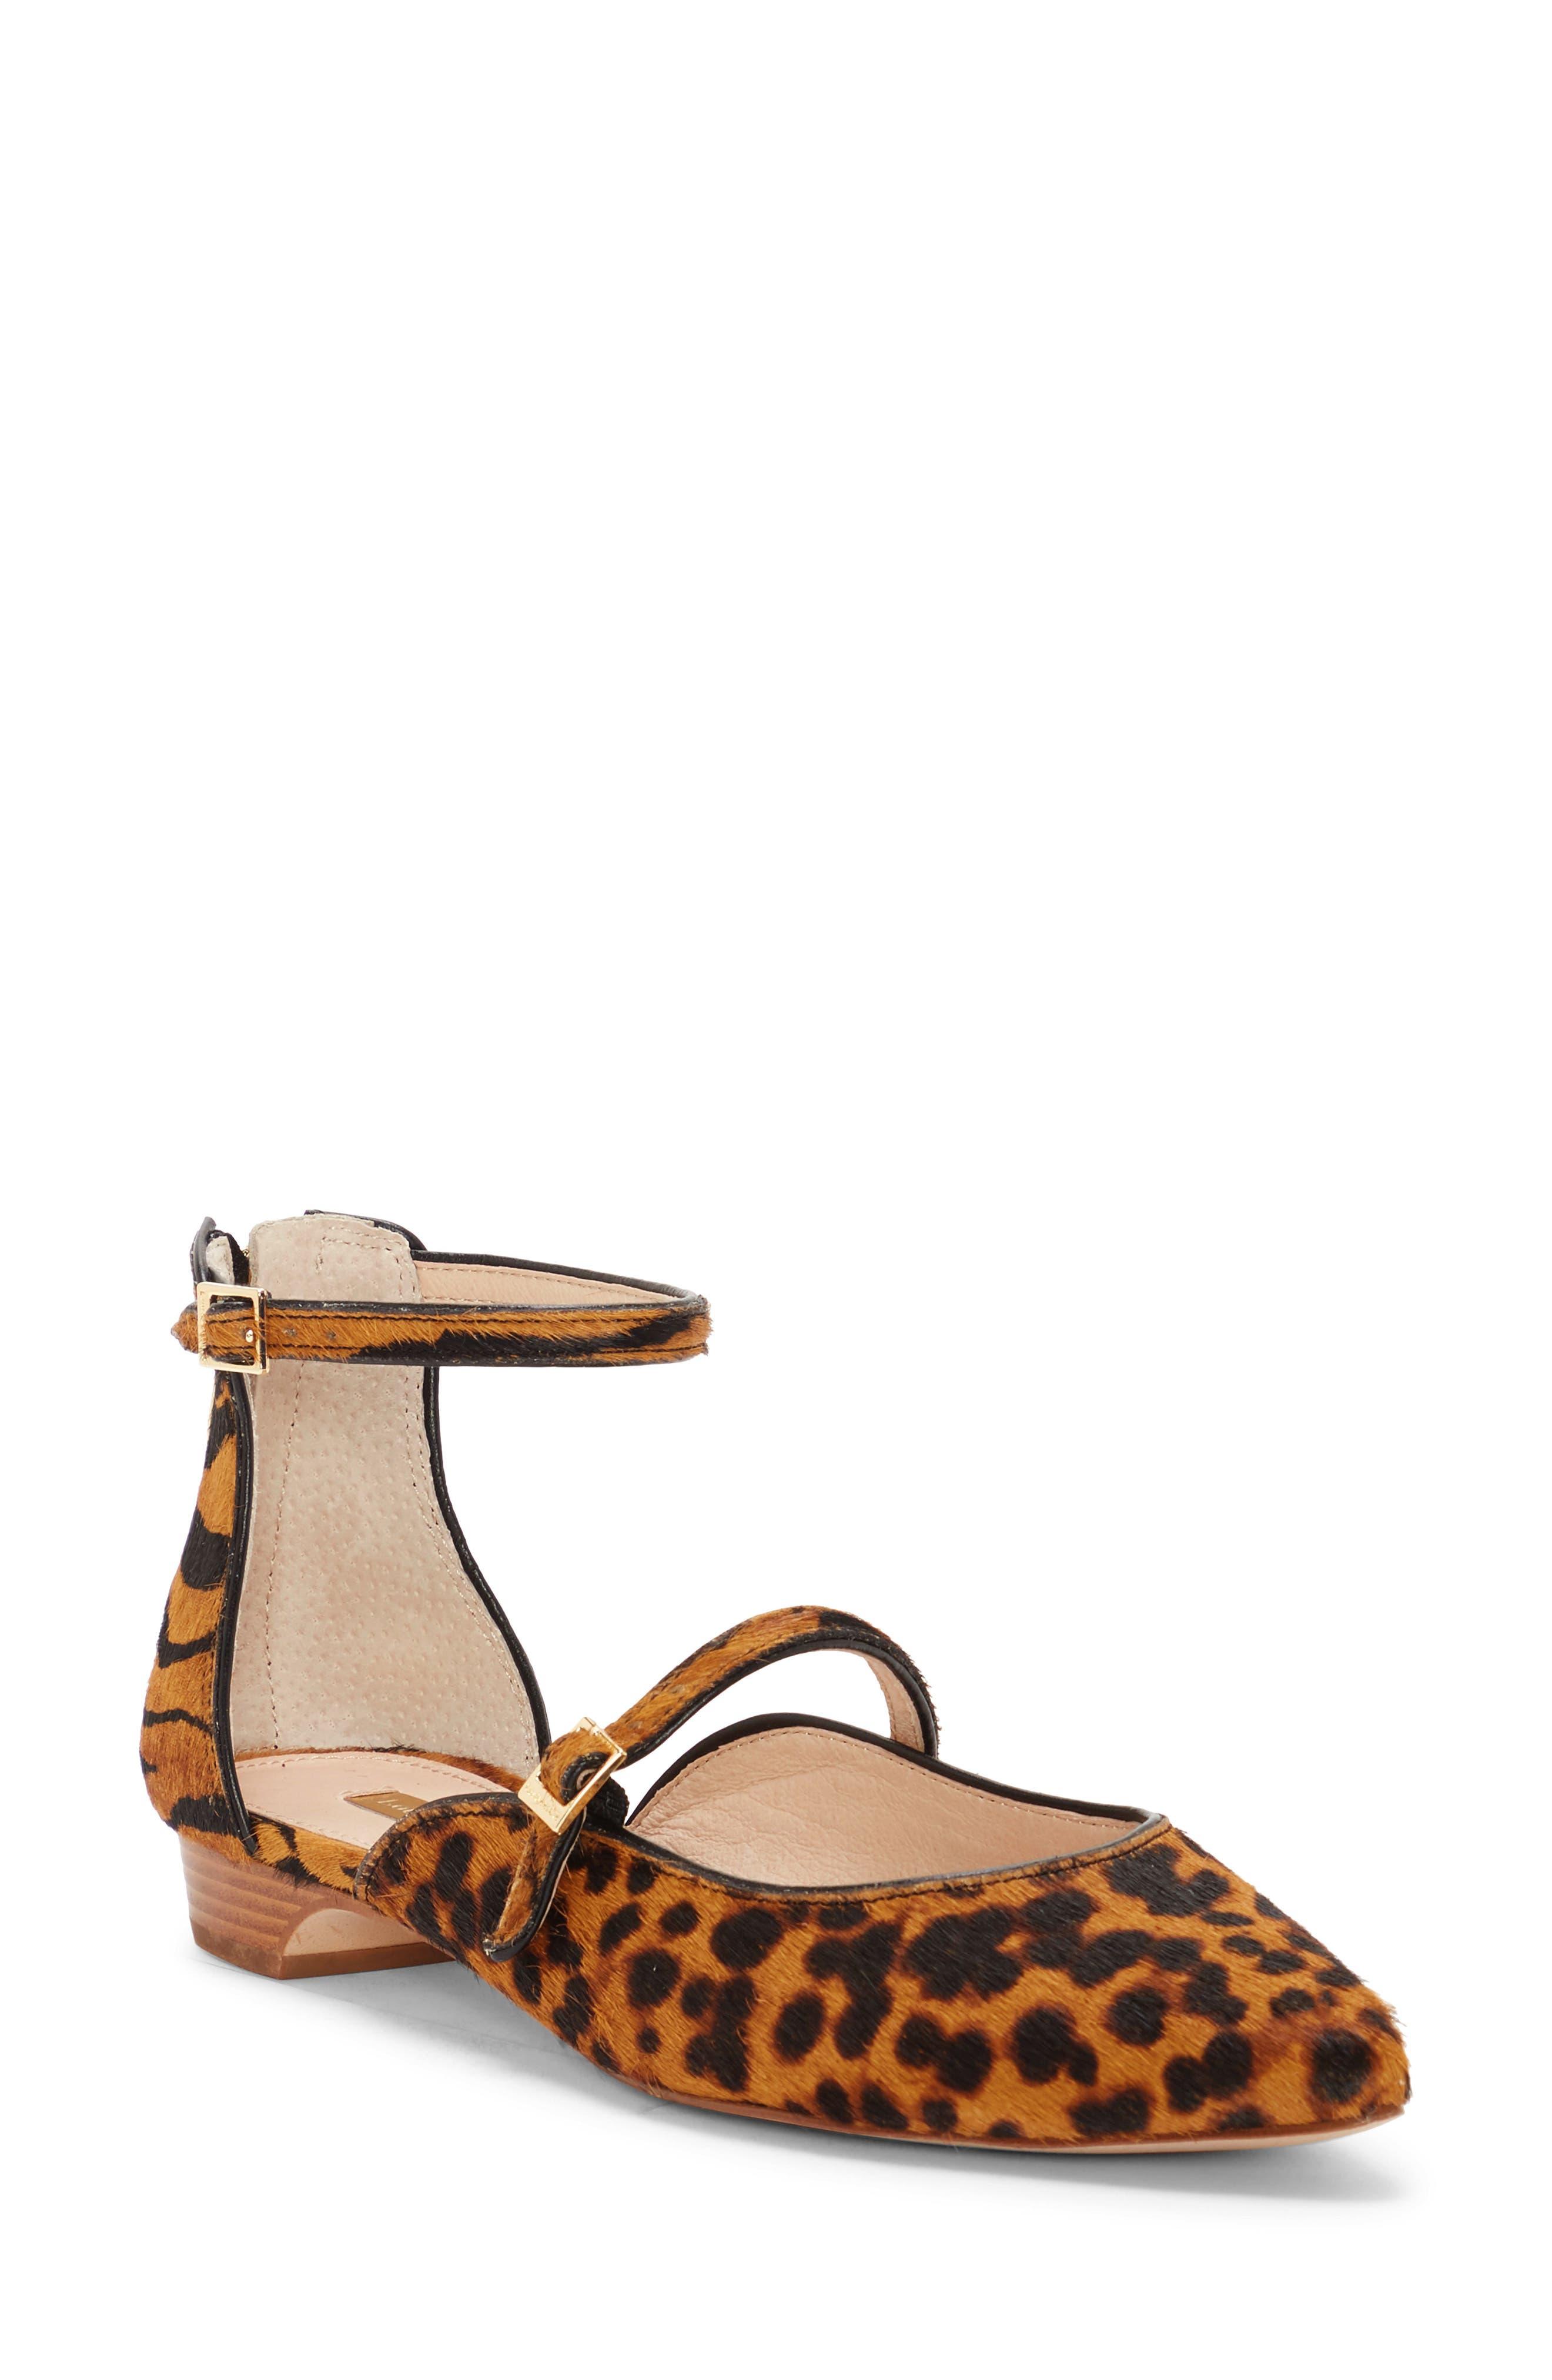 Louise Et Cie Claire Genuine Calf Hair Ankle Strap Flat, Brown